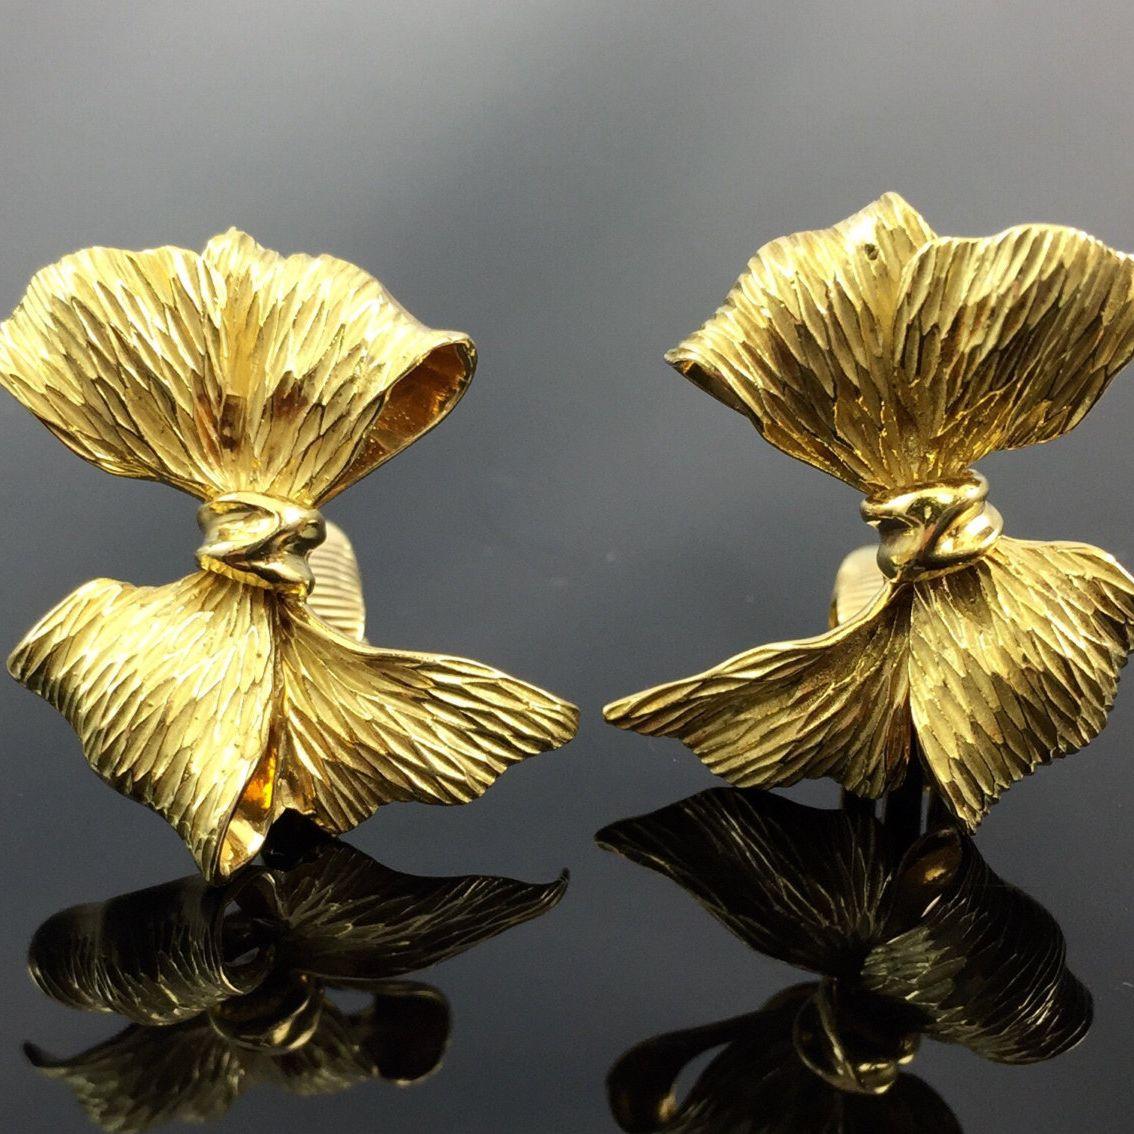 metal bows circa 1980s Vintage Red Earrings